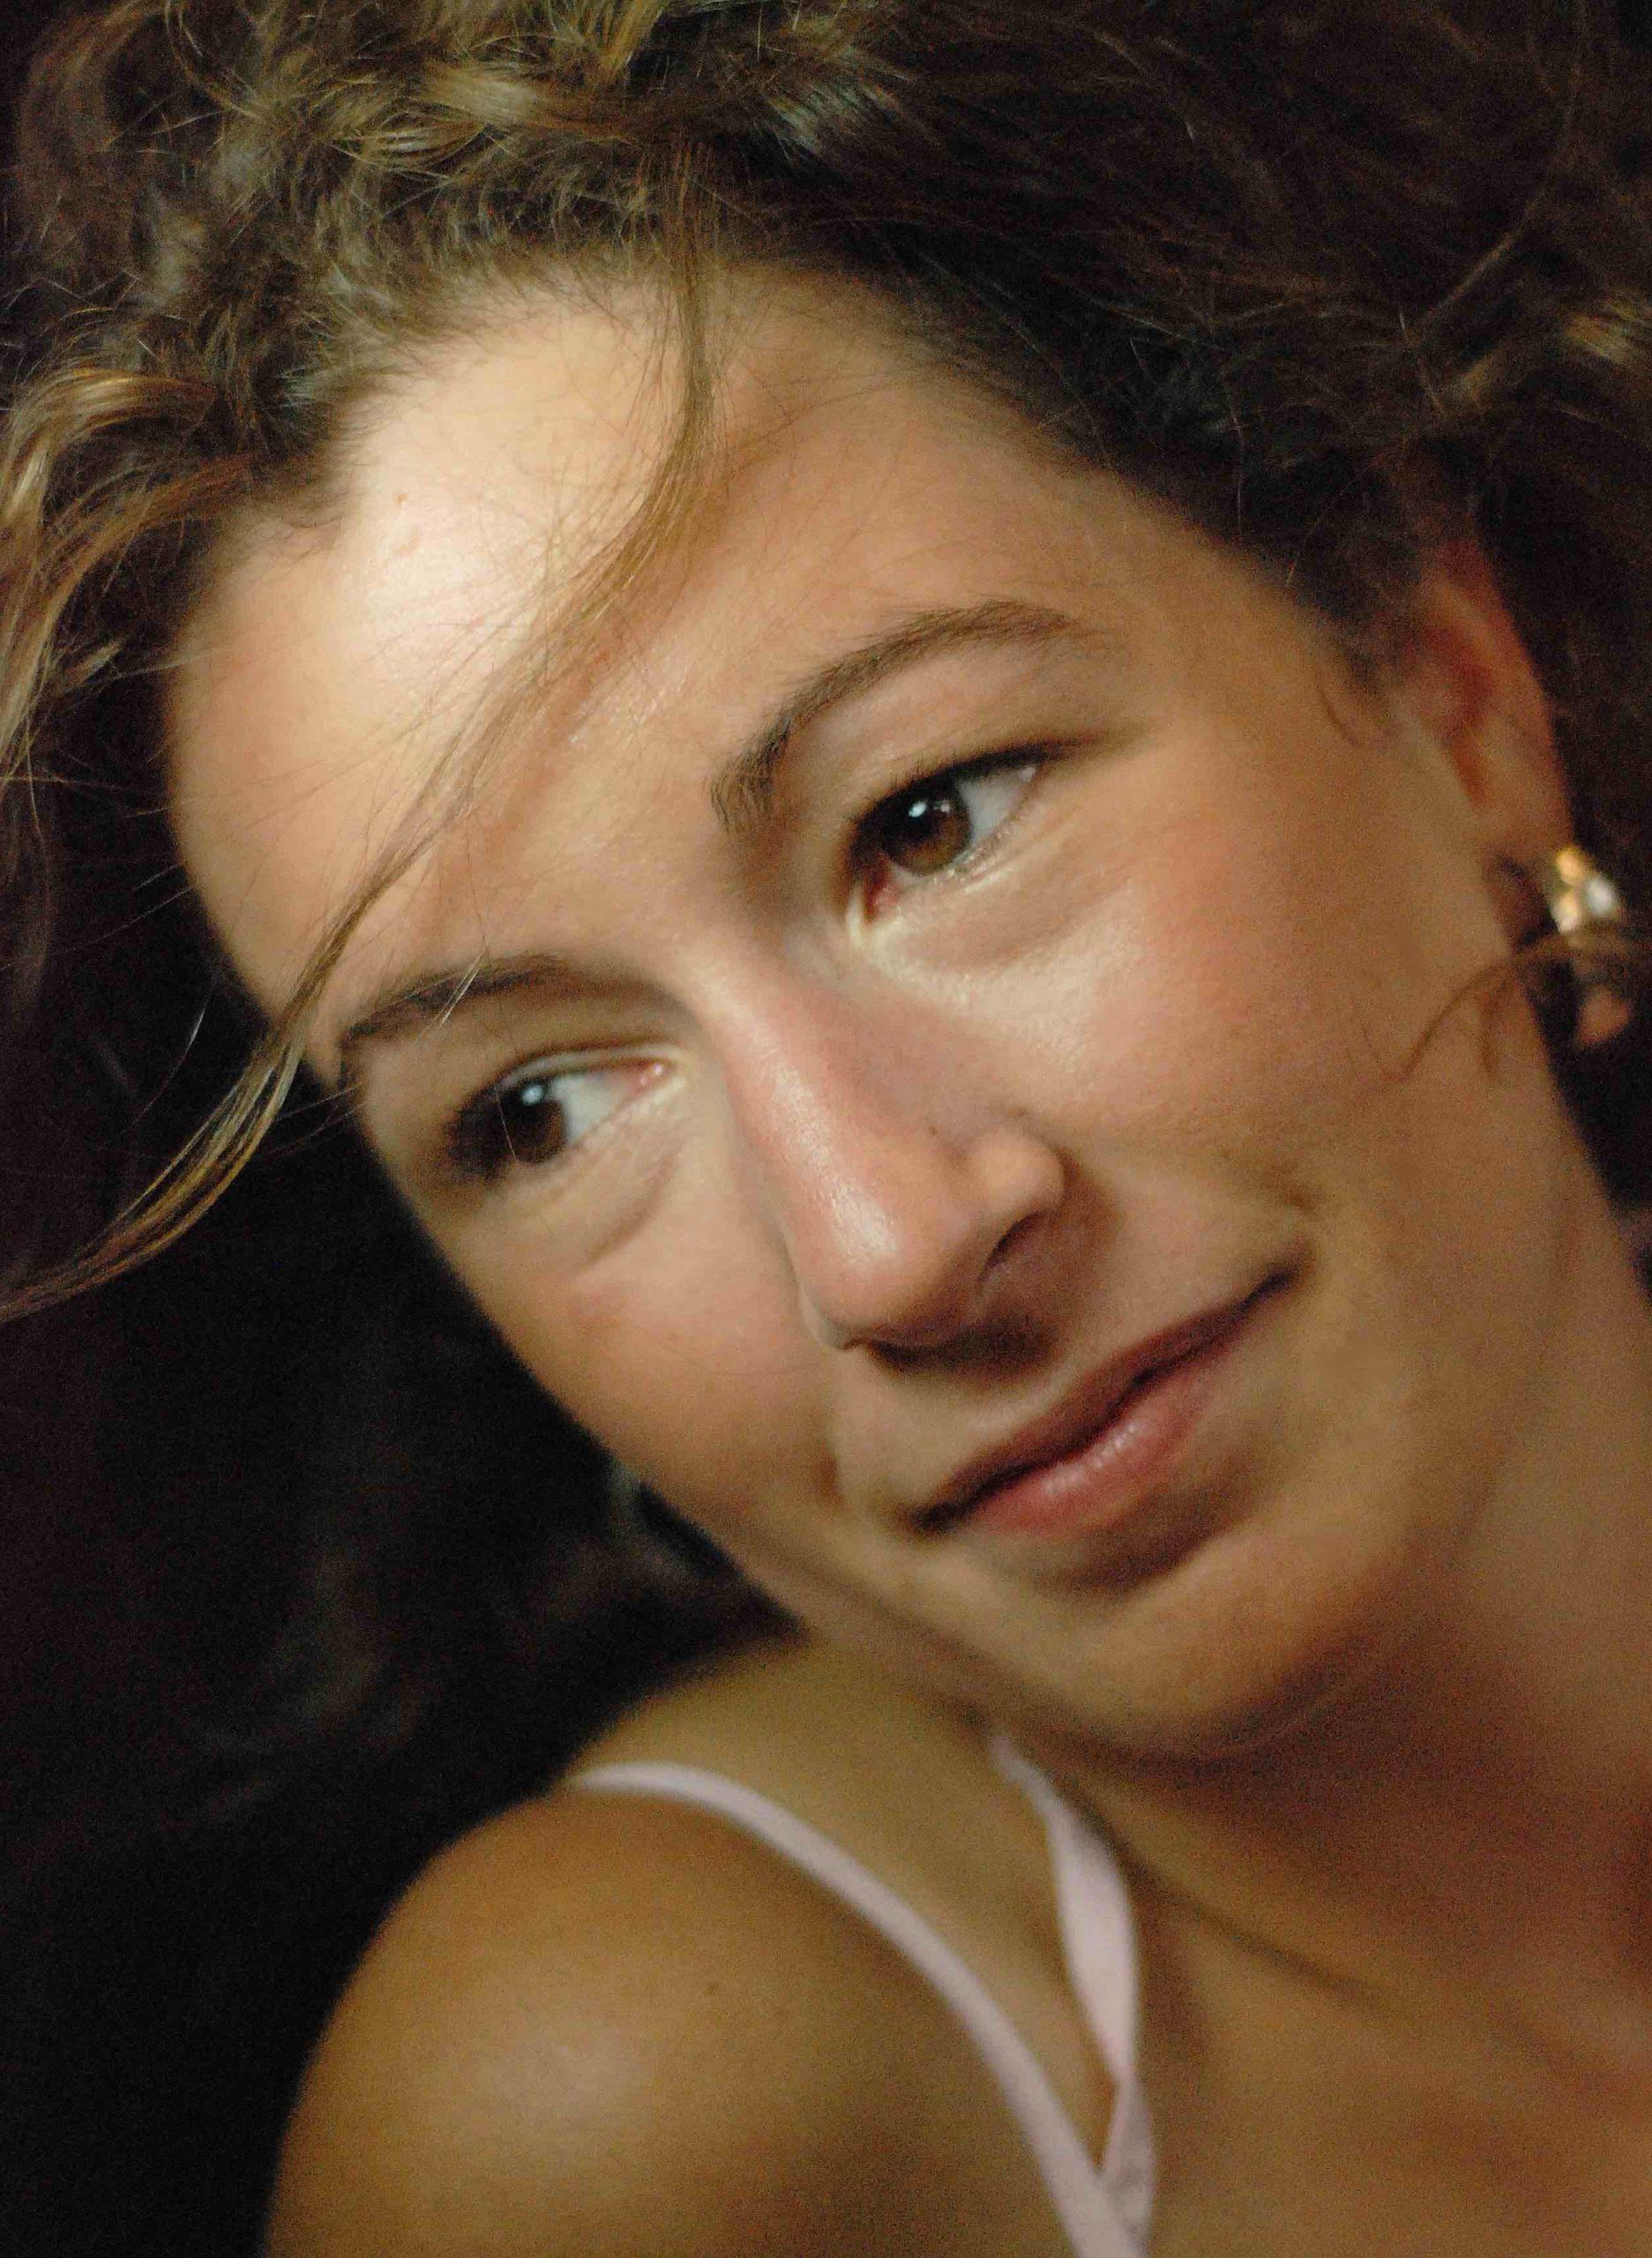 Julie-Bonnafont-portrait-2021-1-scaled.jpg